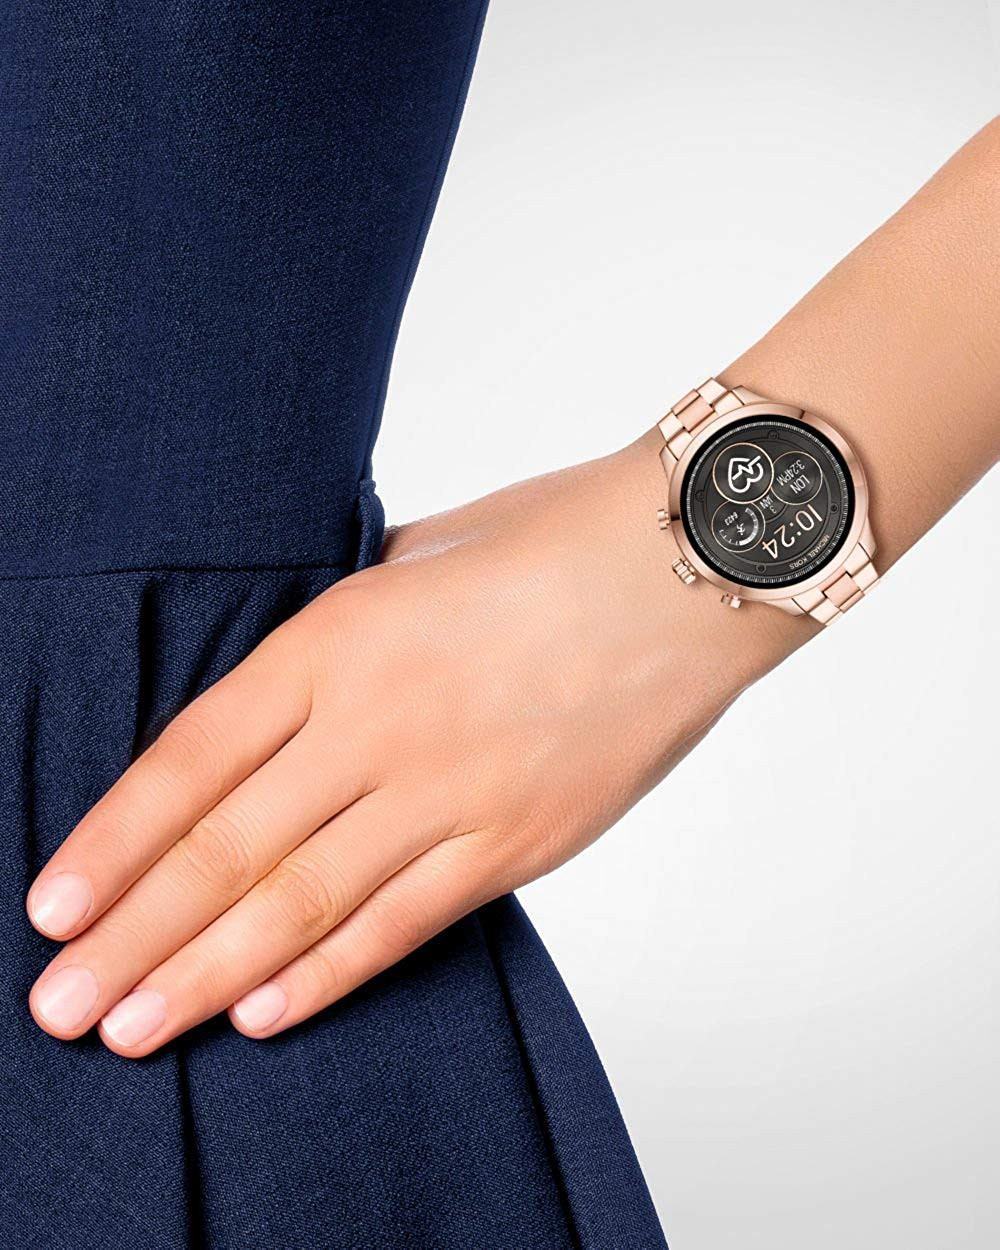 hodinky-nepostradatelny-doplnek-ktere-trendy-vladnou-roku-2019-24